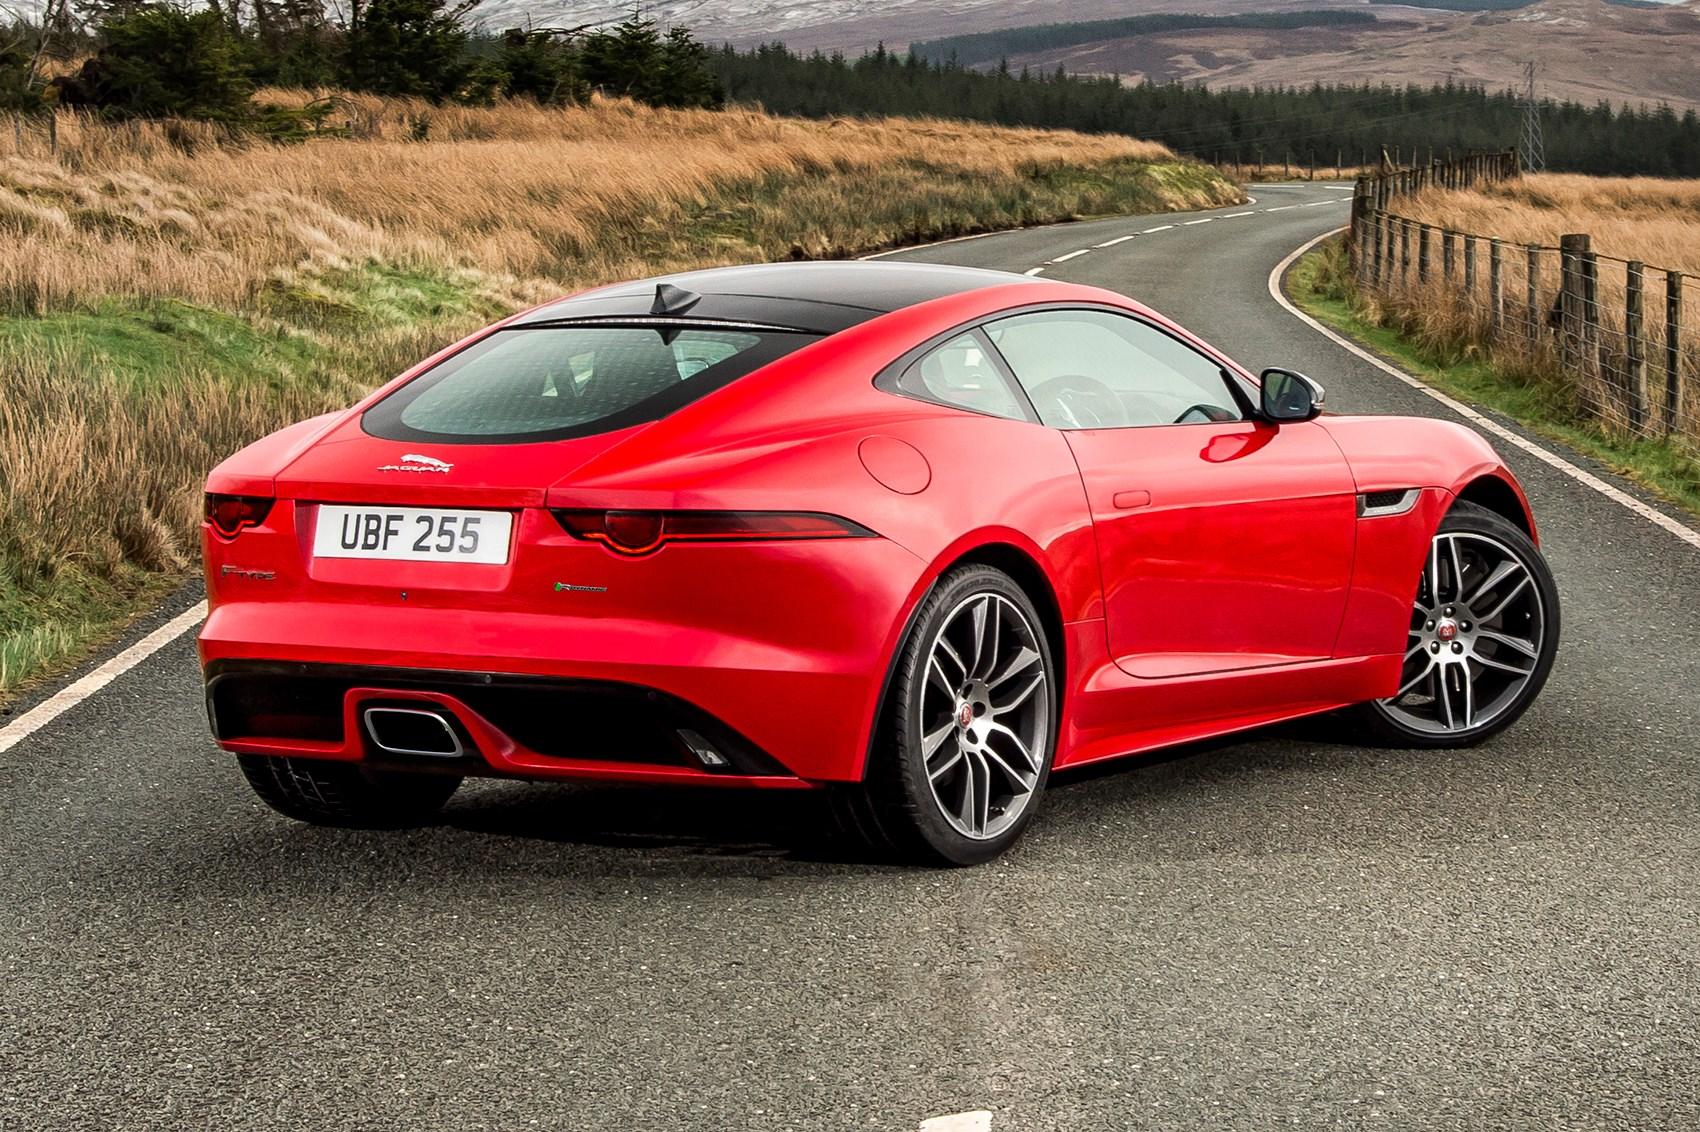 The New Generation of Jaguar Event – November 2017